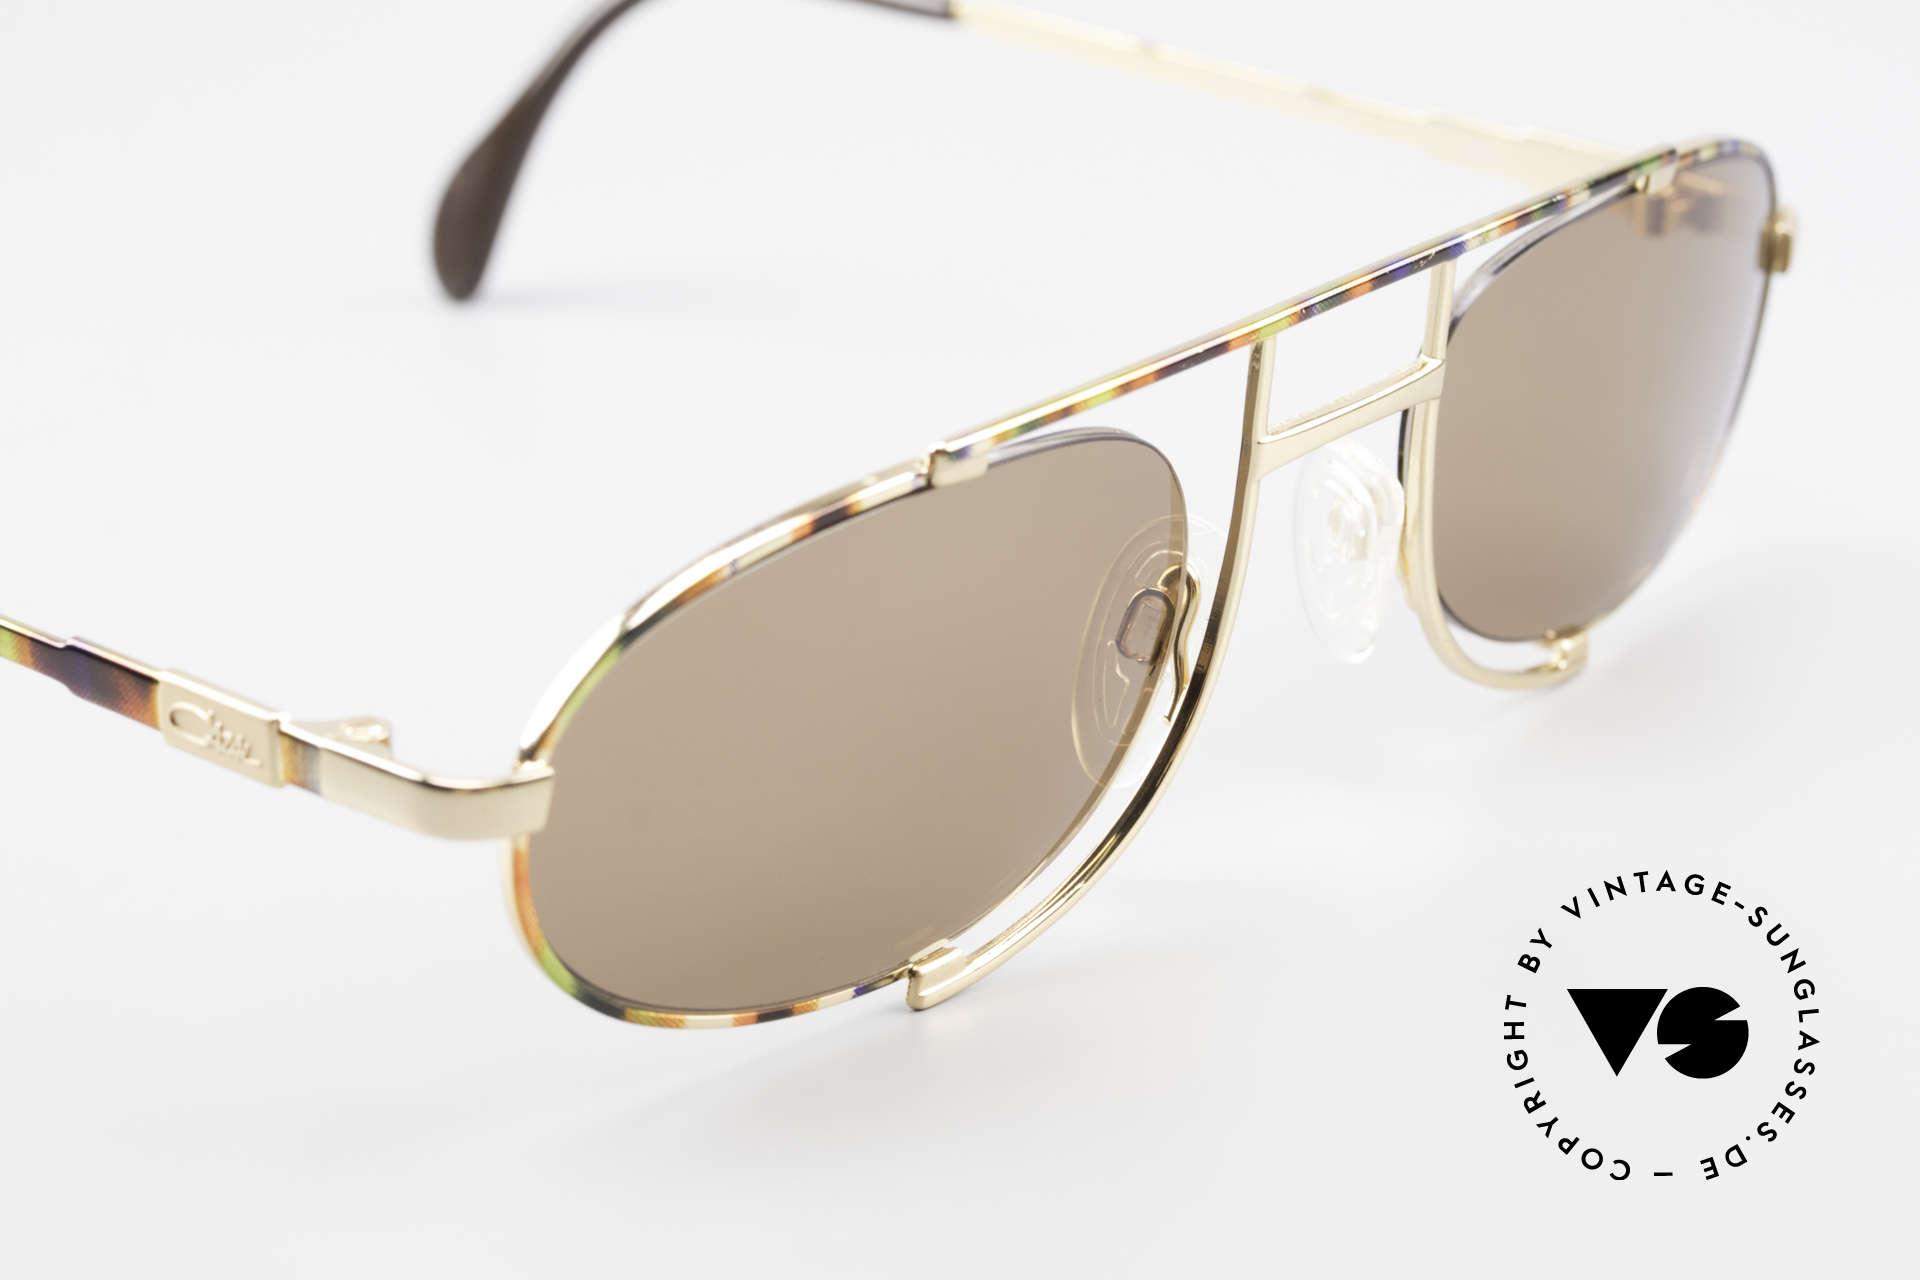 Cazal 753 Rare Oval Designer Sunglasses, Cazal called the paintwork 'maize-pistachio-copper', Made for Men